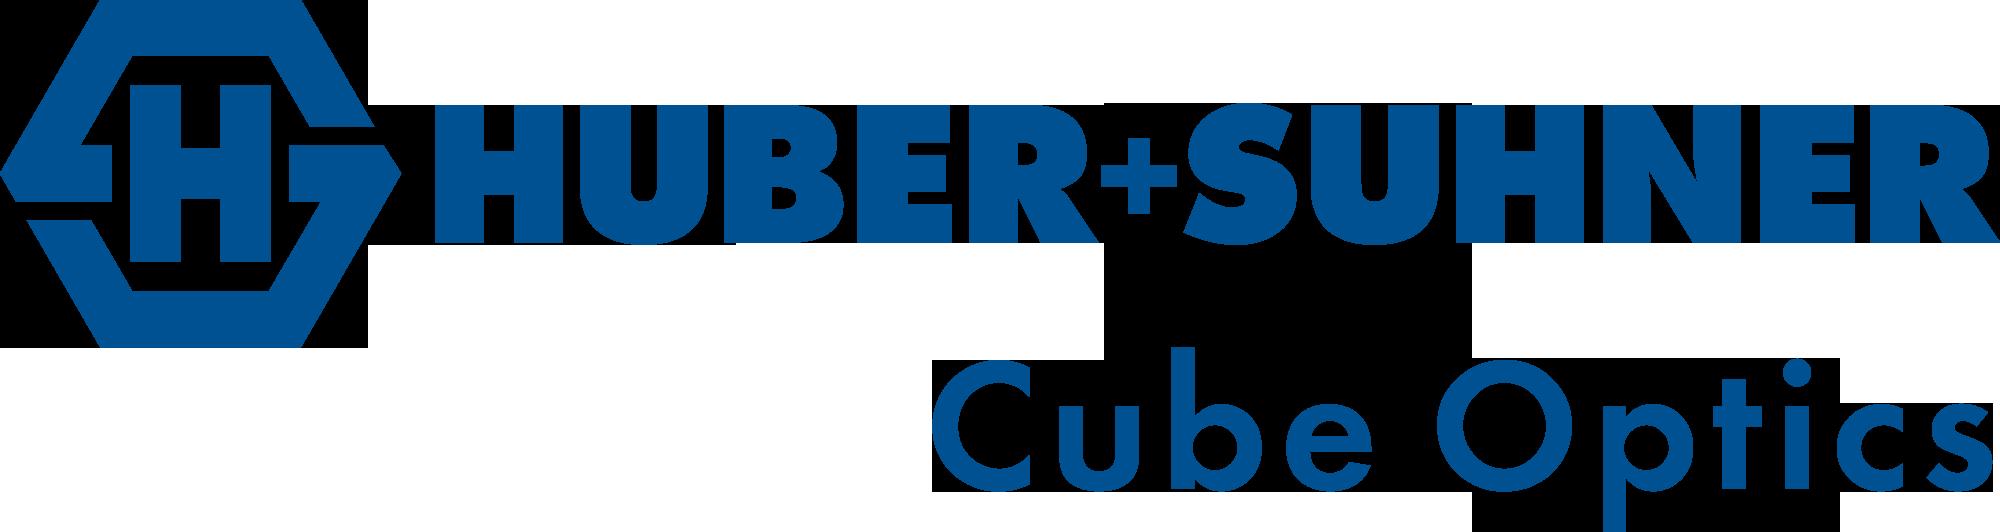 HUBER+SUHNER Cube Optics AG